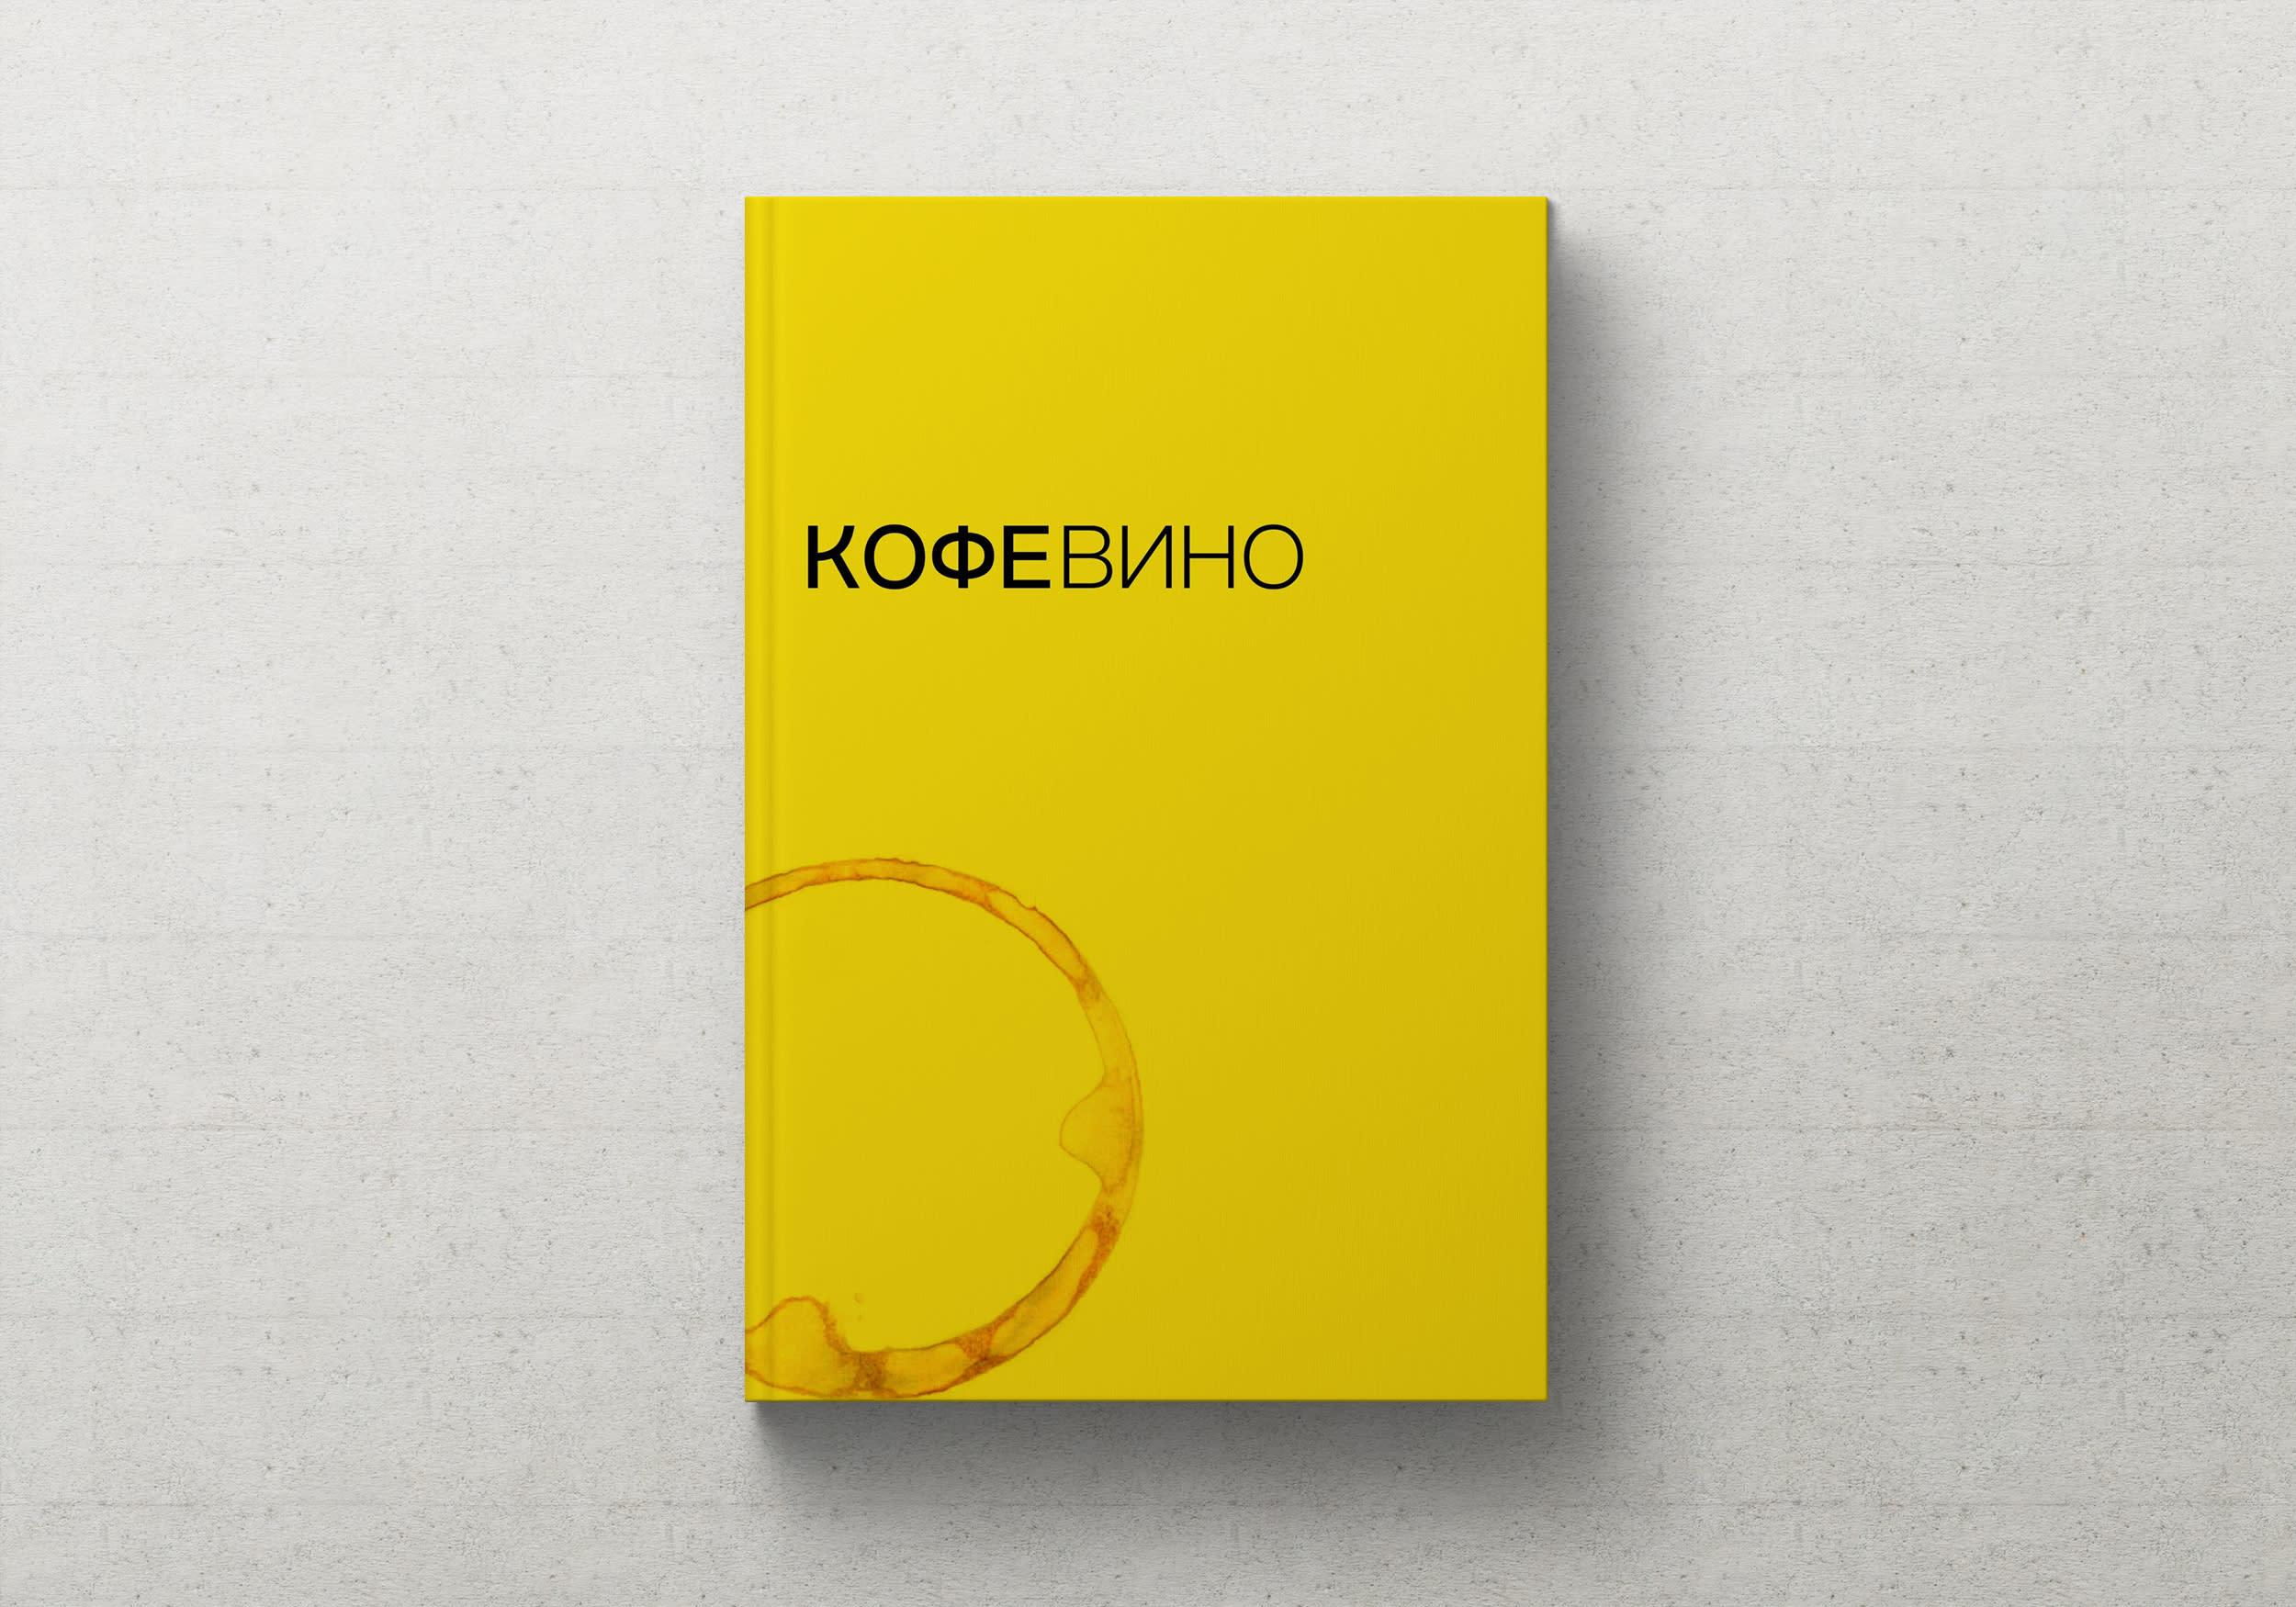 Design A Minimalistic Book Cover Design By Crmblw